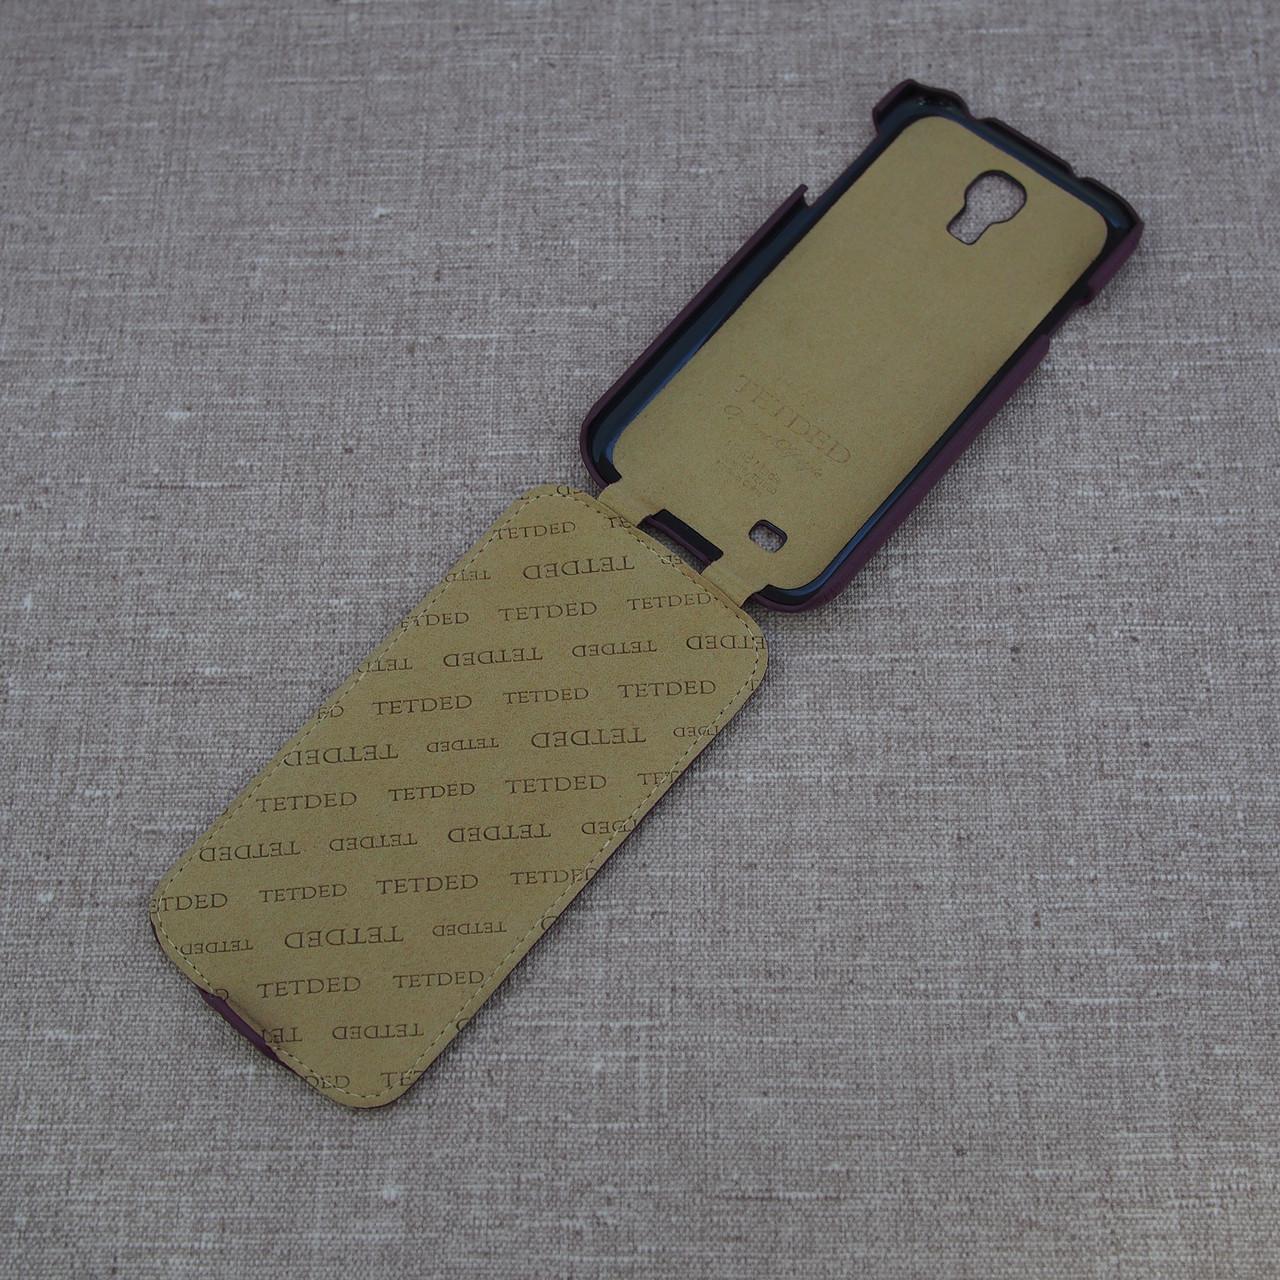 Чехол TETDED Samsung Galaxy S4 purple Для телефона